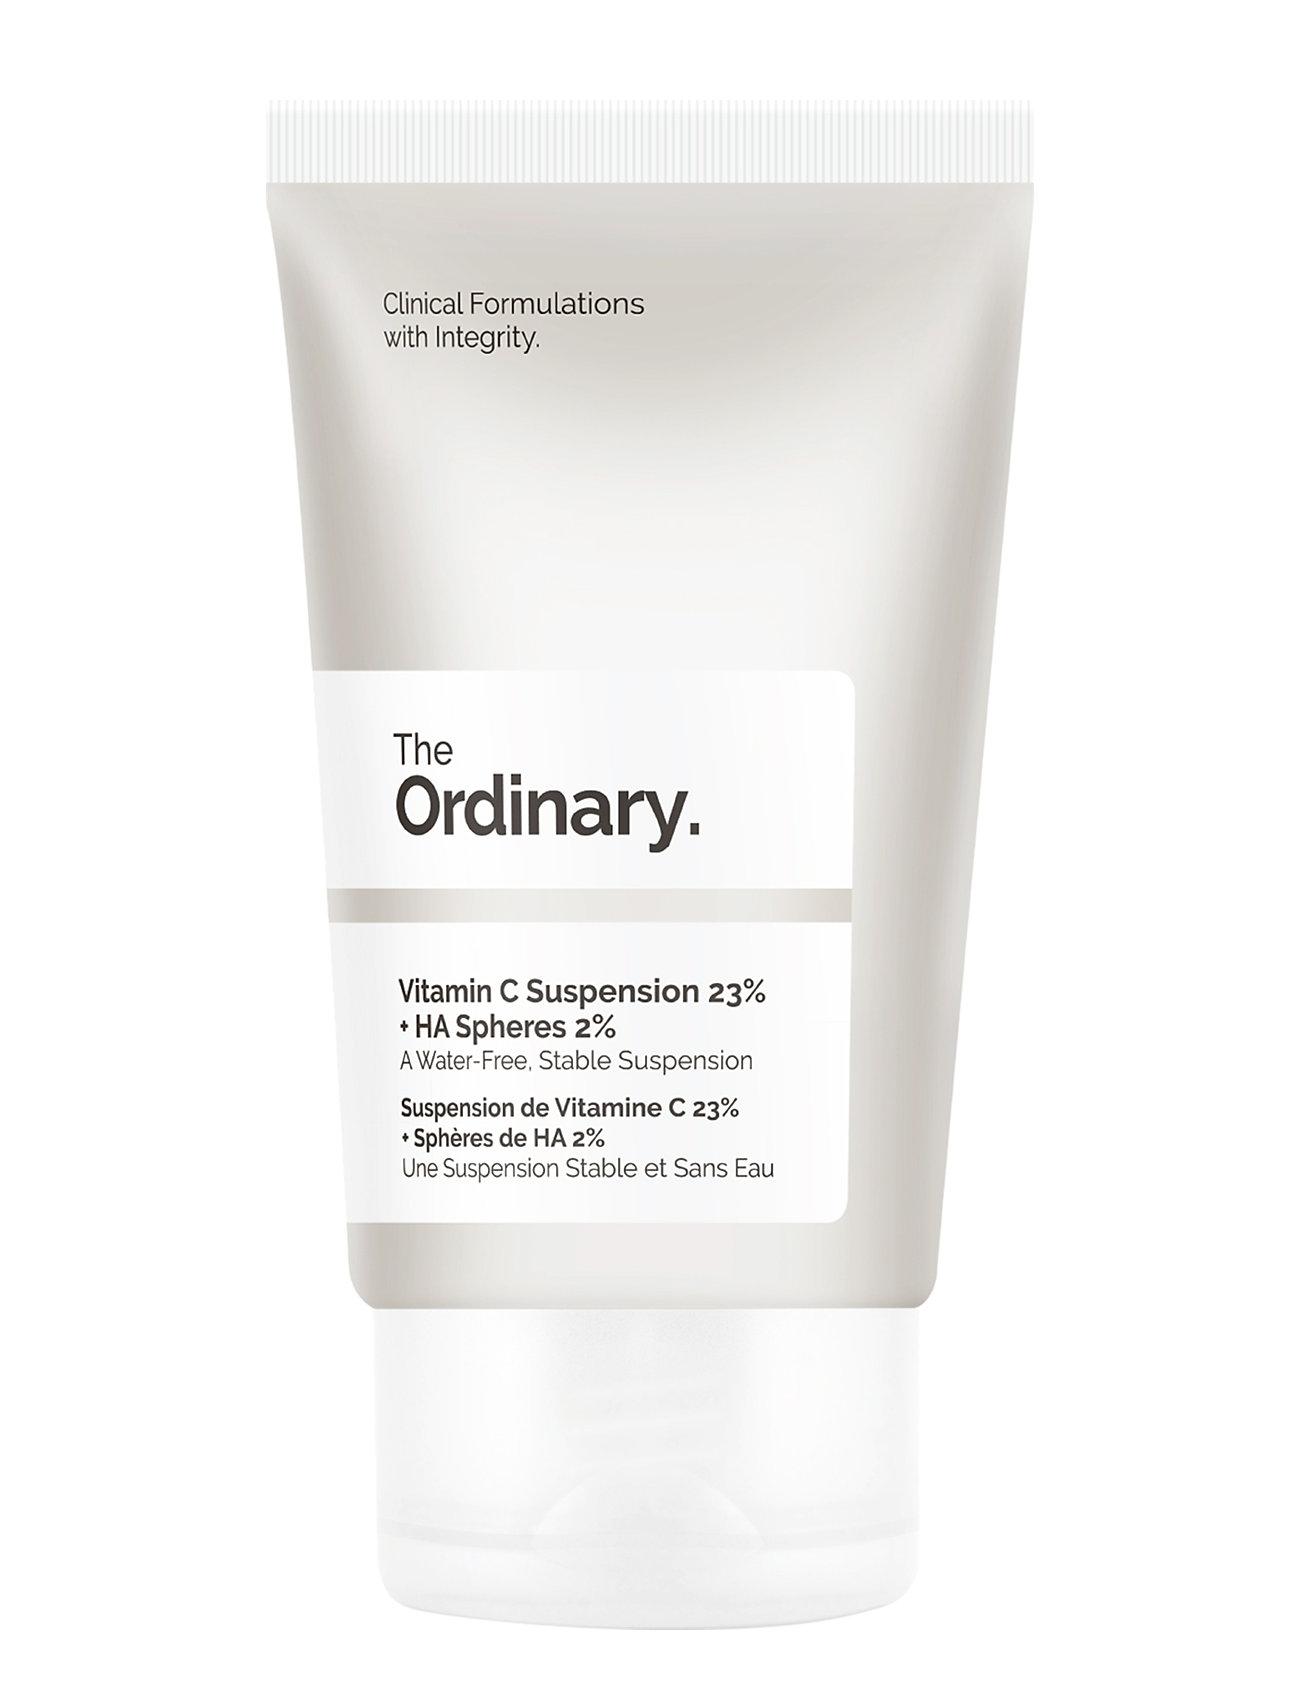 The Ordinary Vitamin C Suspension 23% + Ha Spheres 2% Seerumi Kasvot Ihonhoito Nude The Ordinary